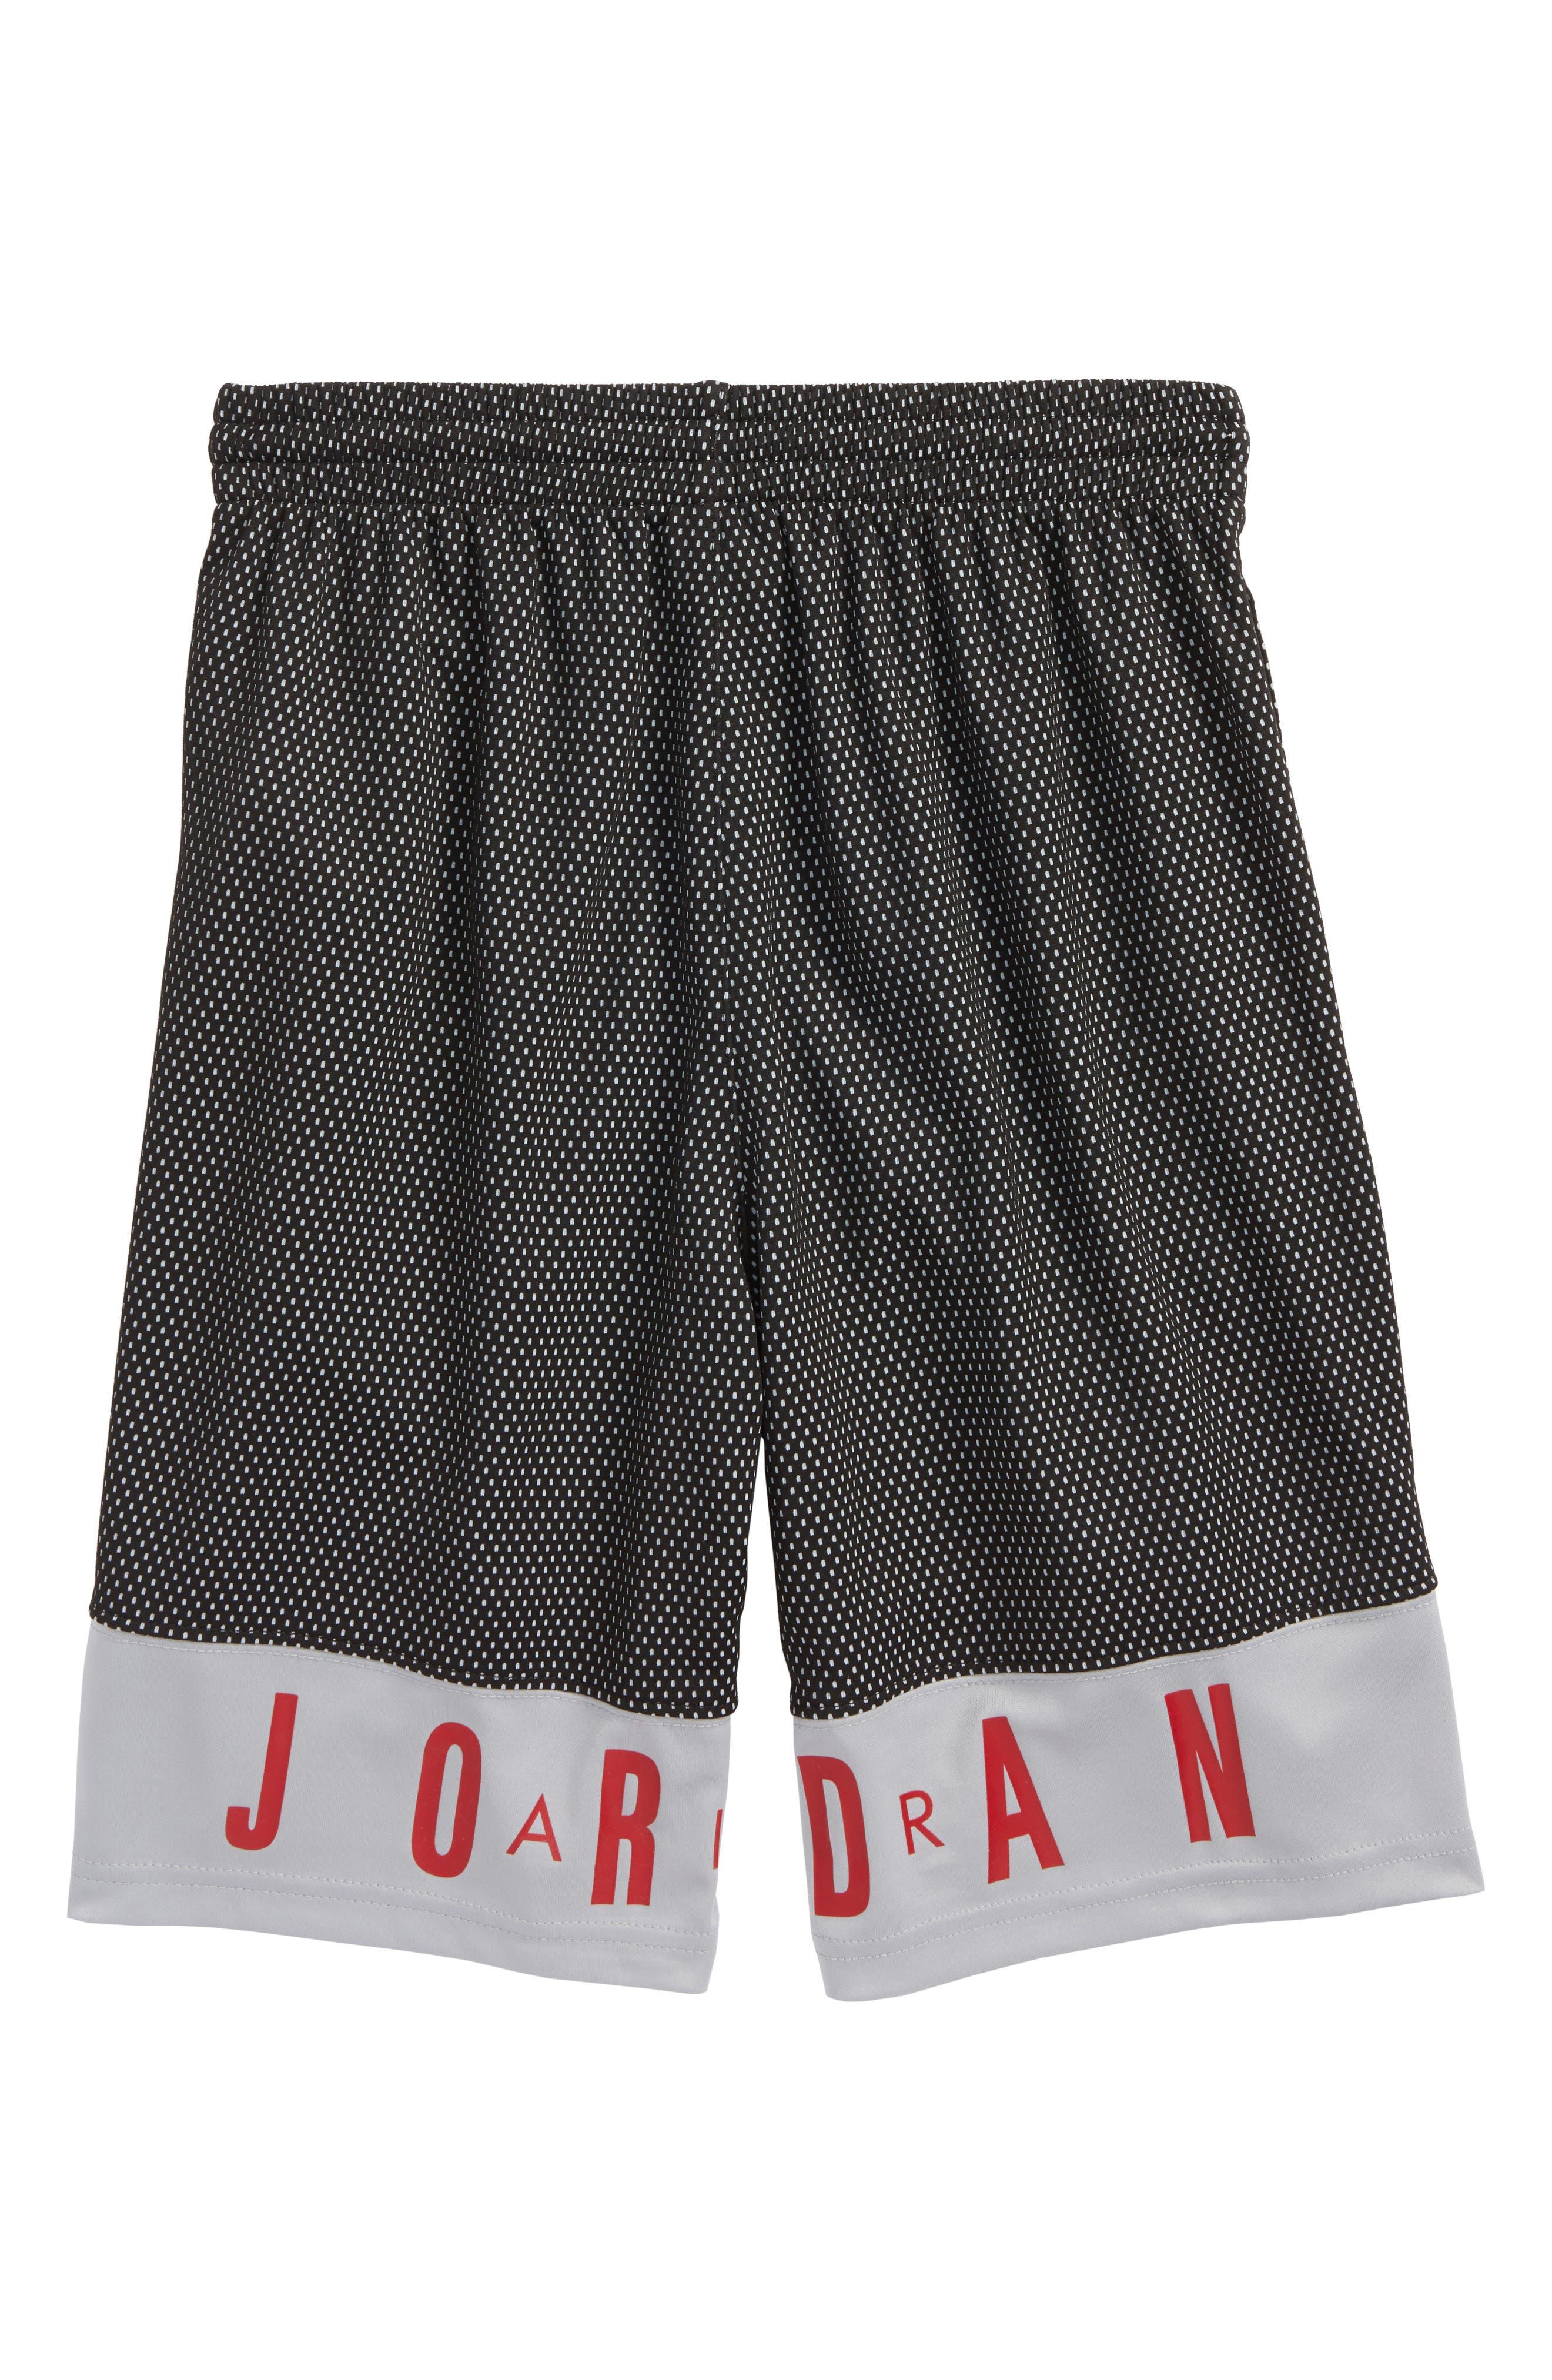 Alternate Image 2  - Jordan AJ 90s D2 Mesh Shorts (Big Boys)